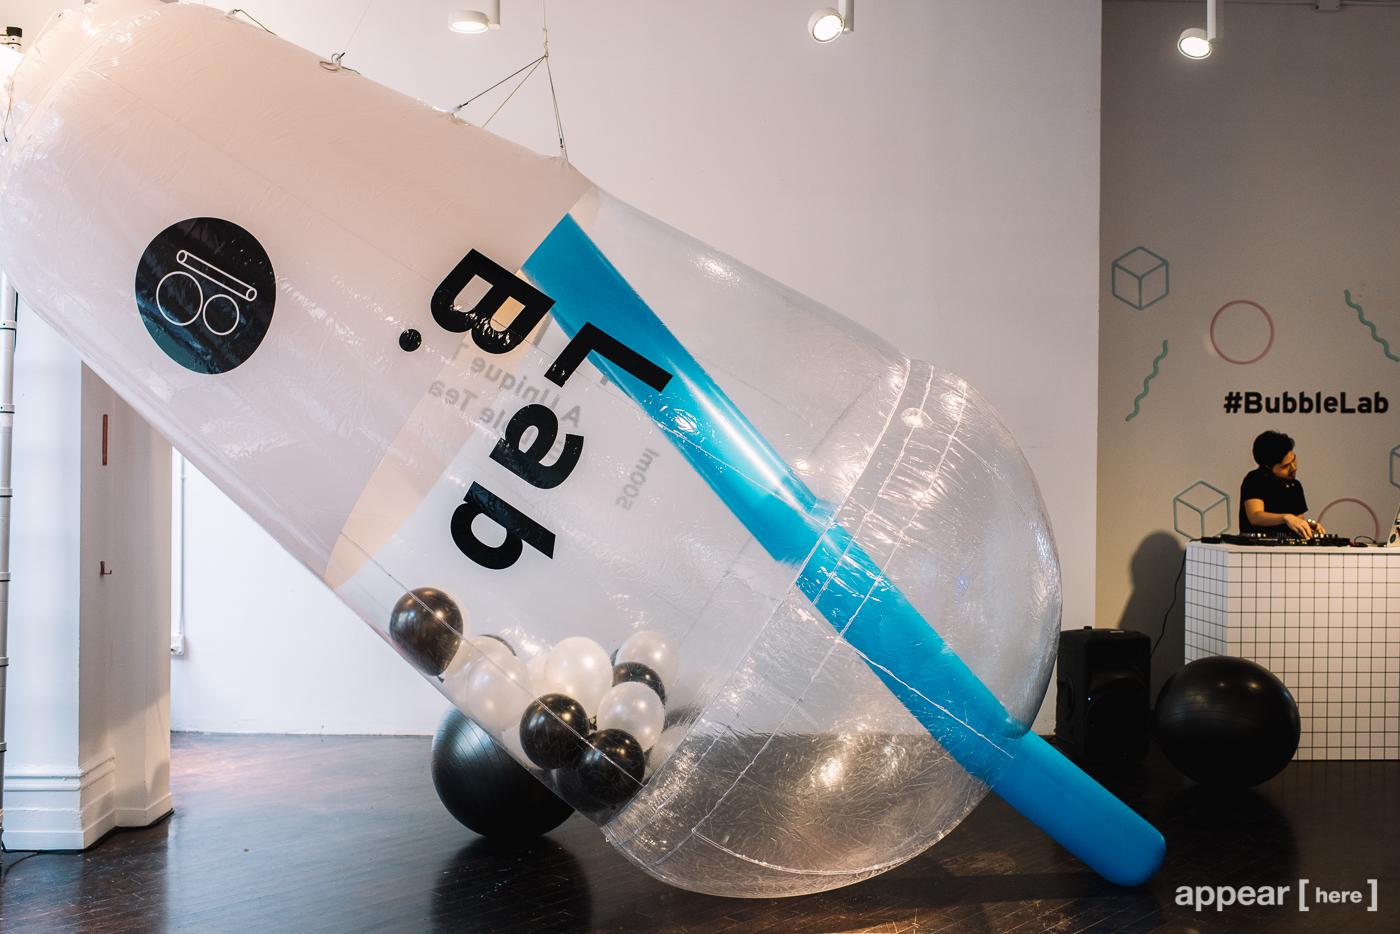 Bubble tea balloon. Photo credit: AppearHere